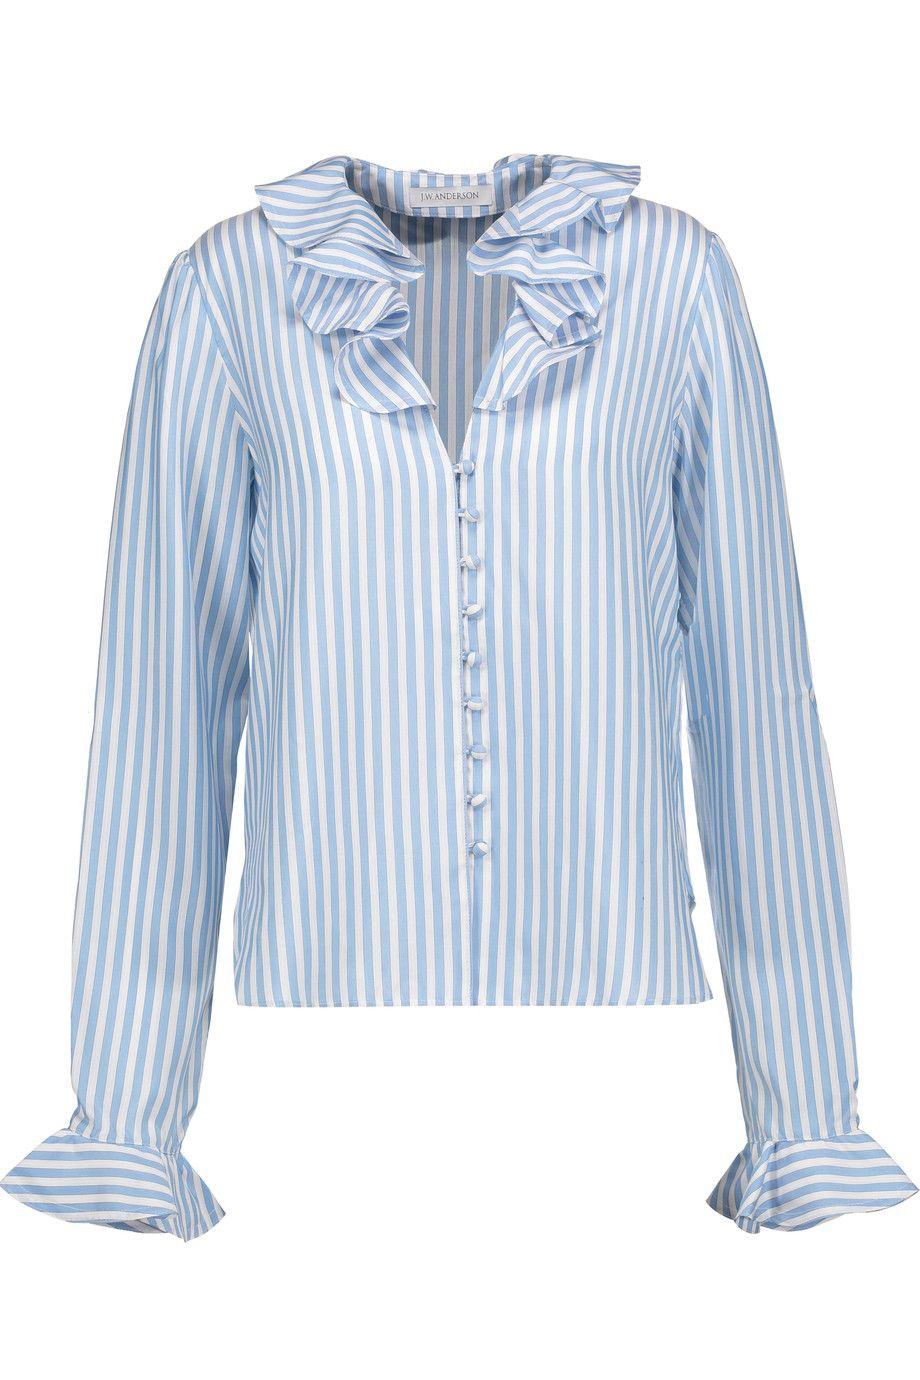 Striped silk blouse J.W.Anderson Sale Cheap Online LRktrLPJDV